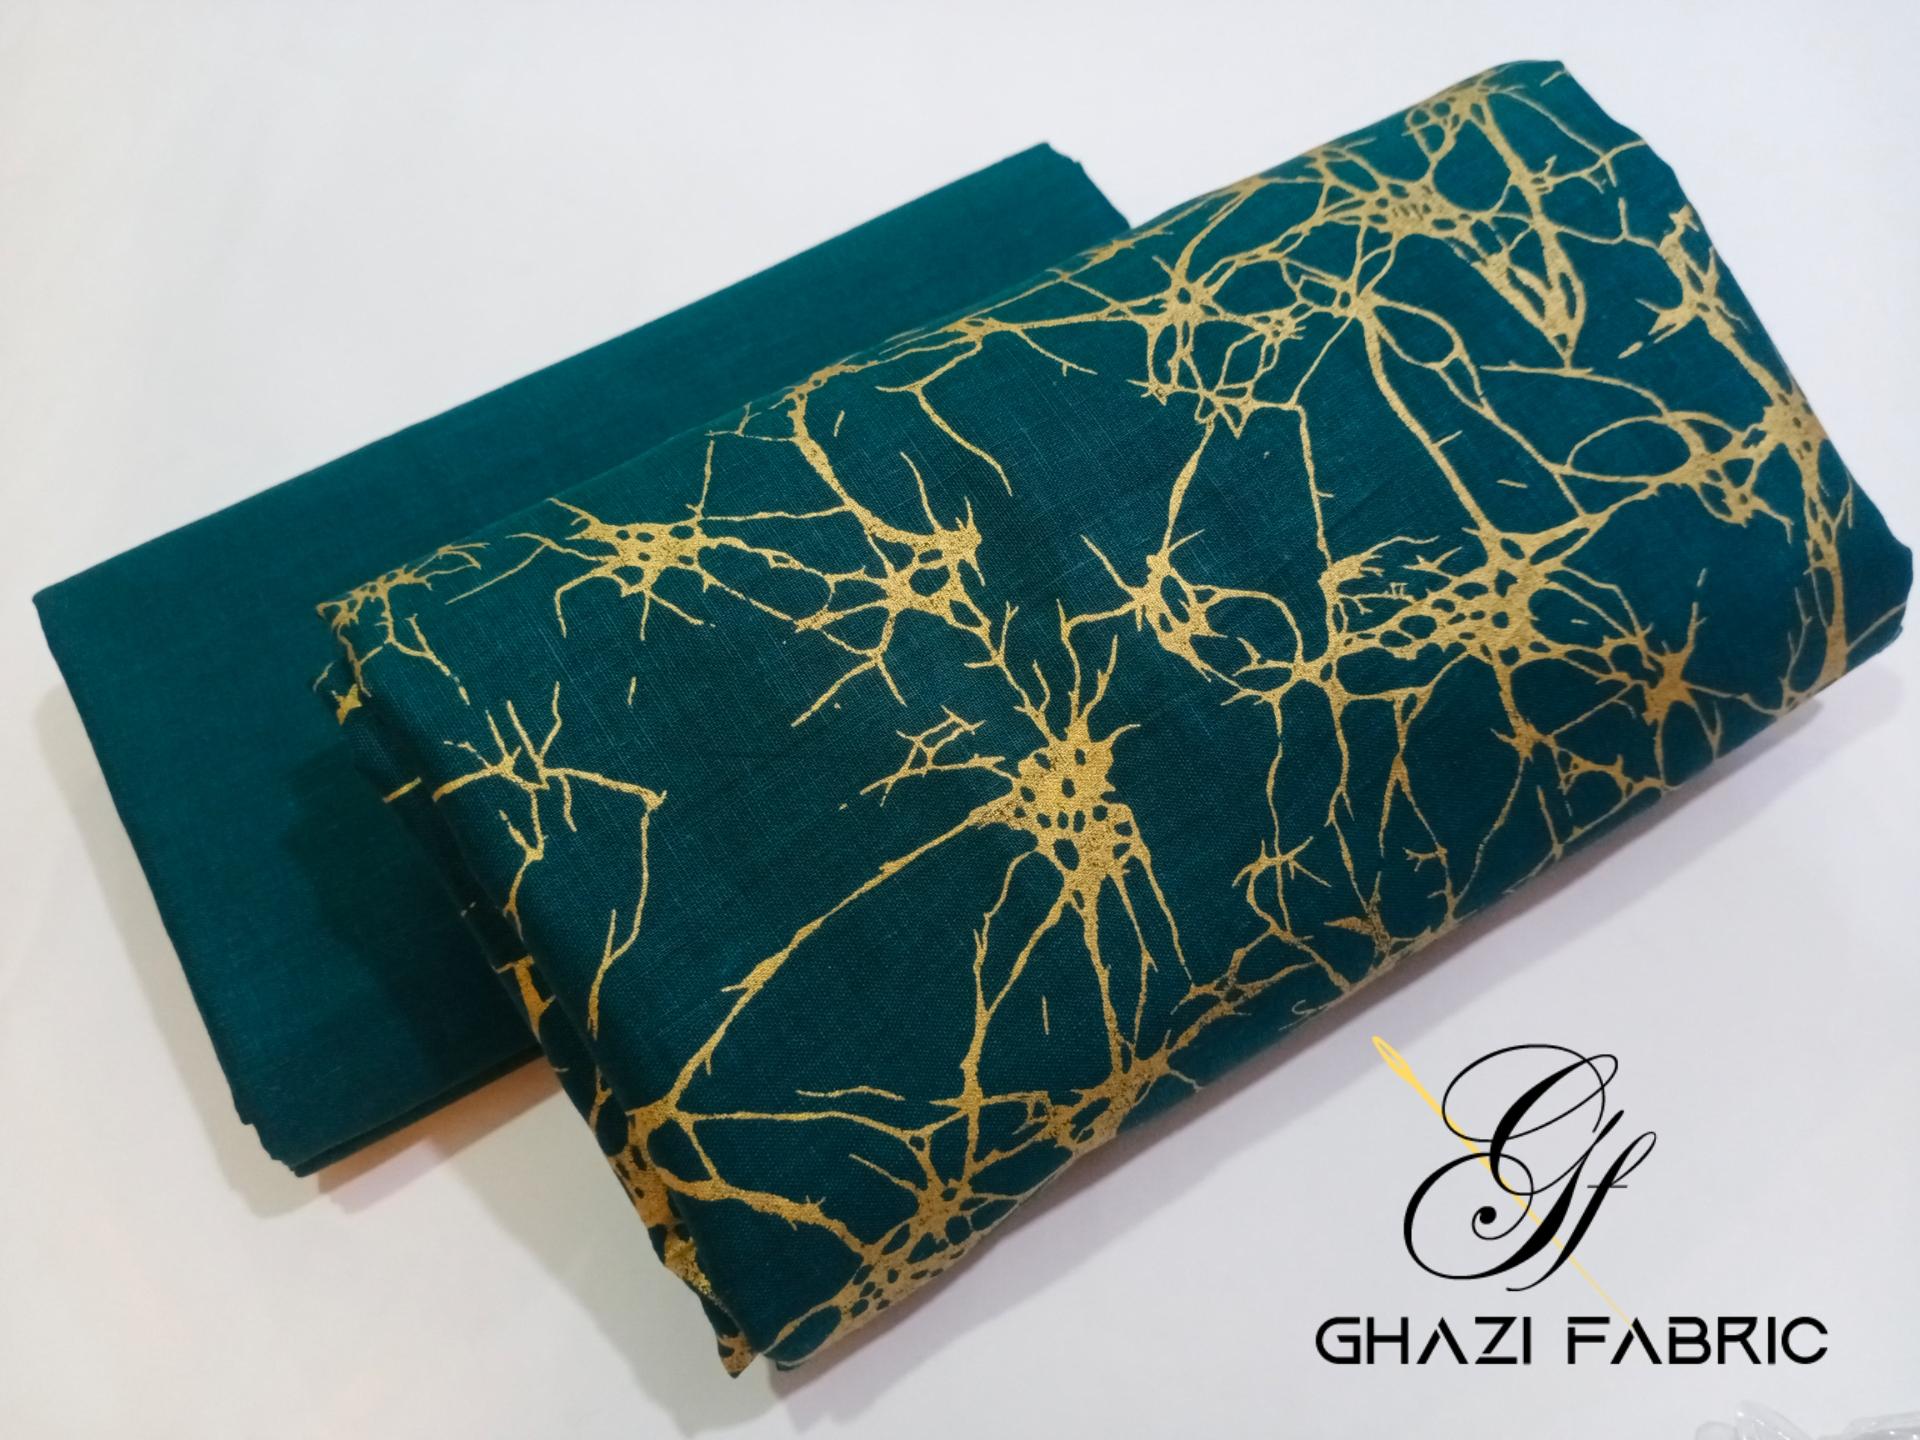 Ghazi fabric  Lawn Collection Ghazi Lawn fantasy  Unstitch Shirt & Trouser summer collection 2 pc Lawn Fantasy volume 2  women clothes zinc (GF712)